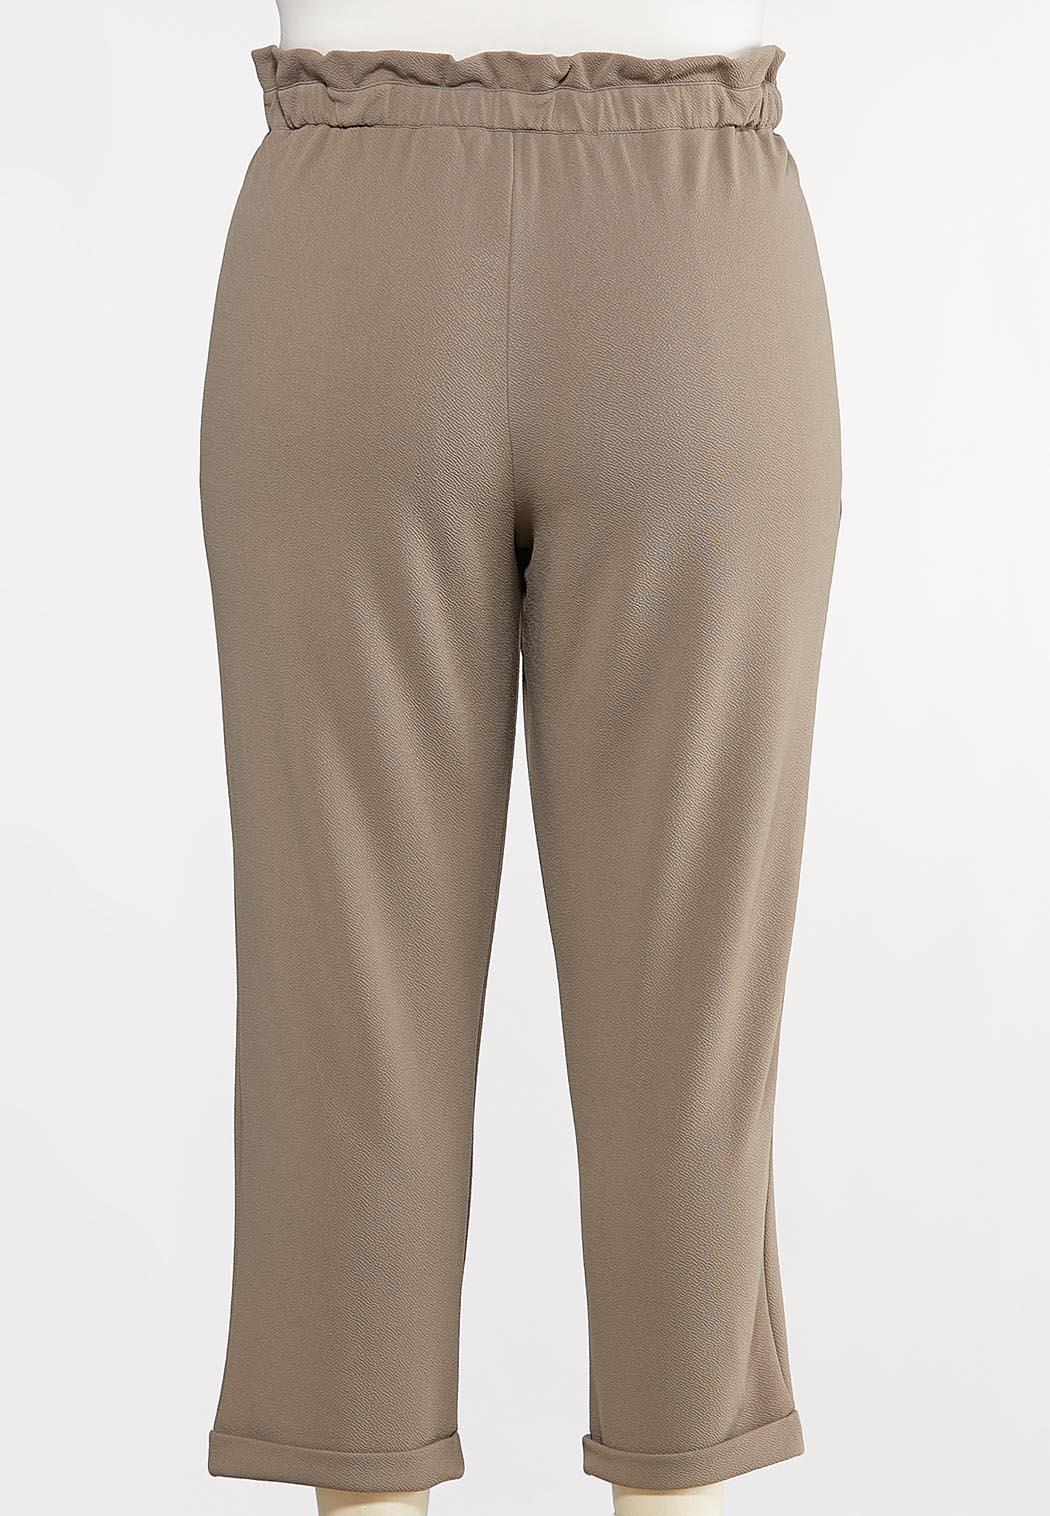 Plus Petite Crepe Paperbag Waist Pants (Item #44108313)